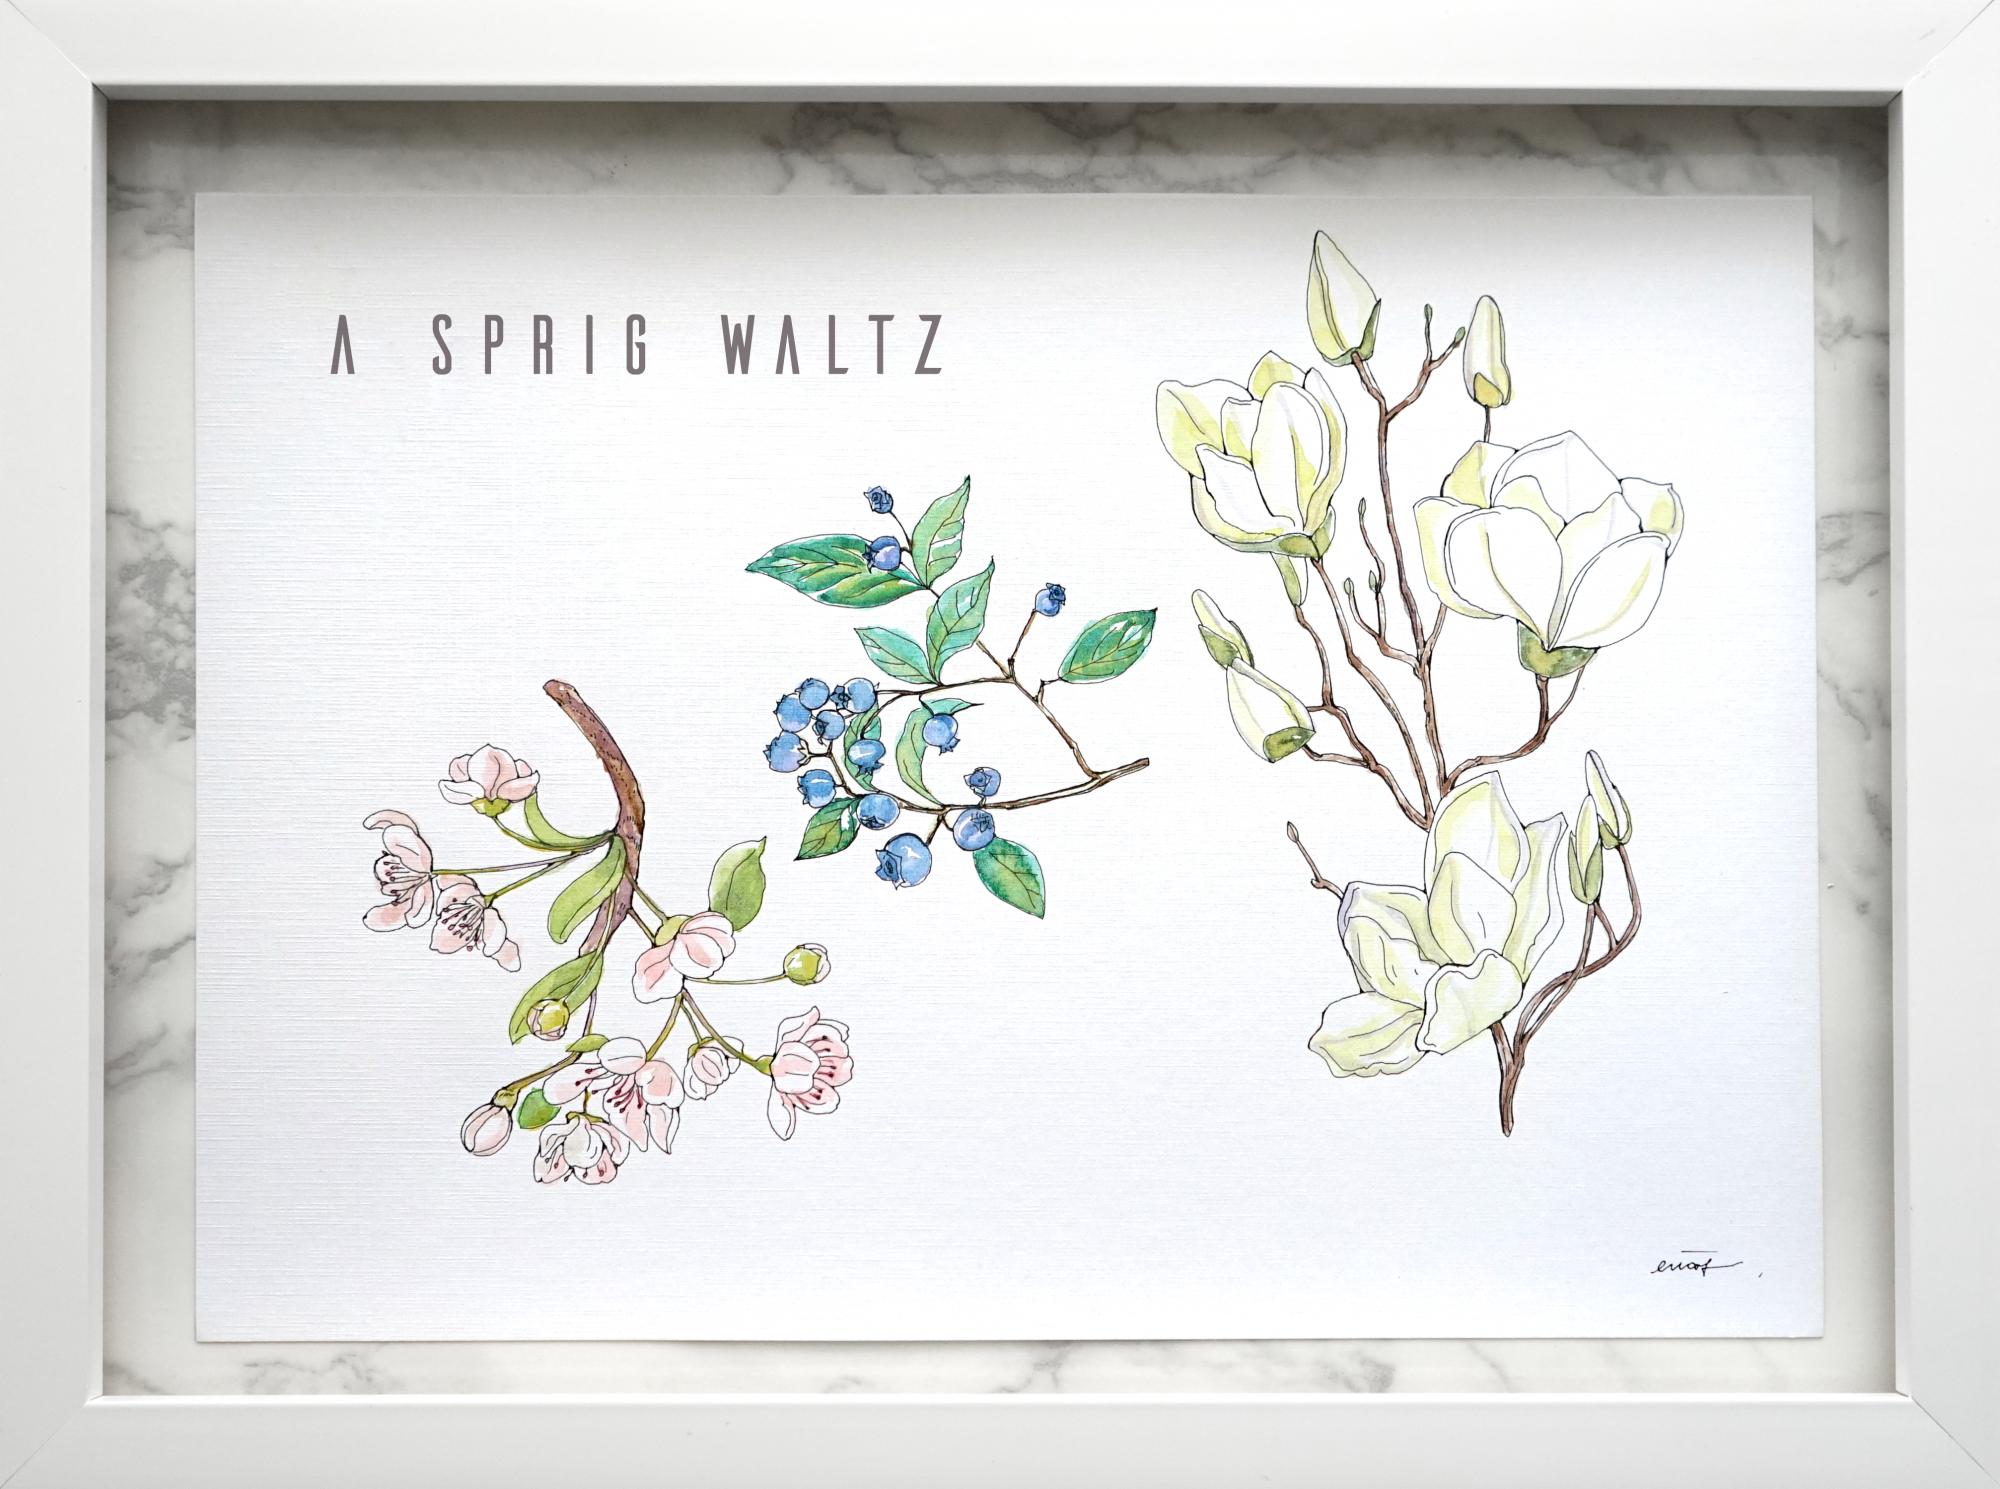 a sprig walts